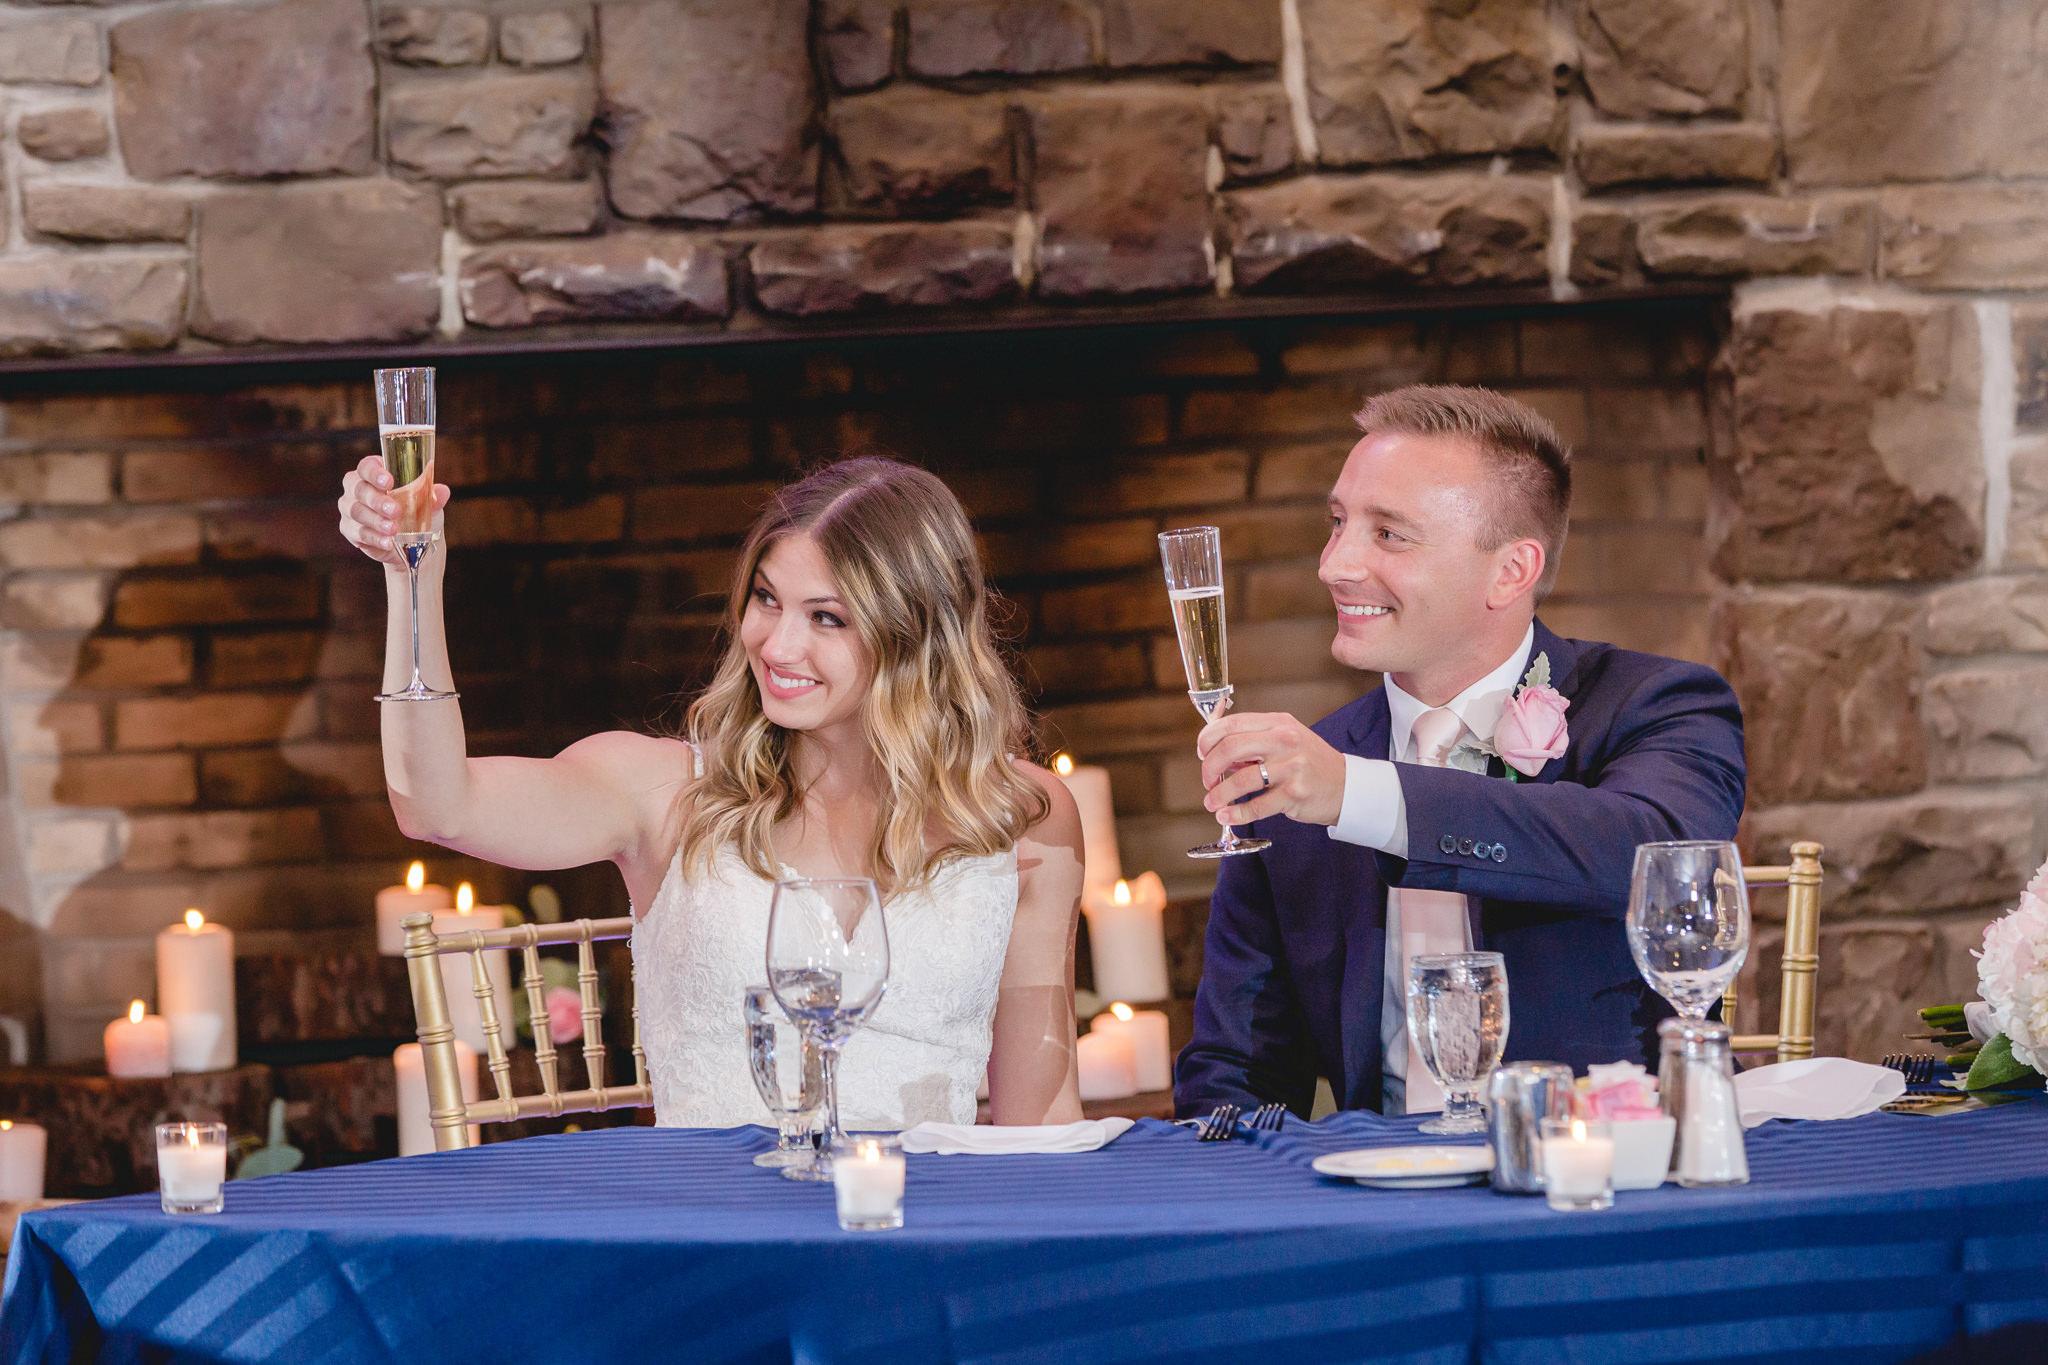 Newlyweds toast at their wedding reception at Hidden Valley Resort